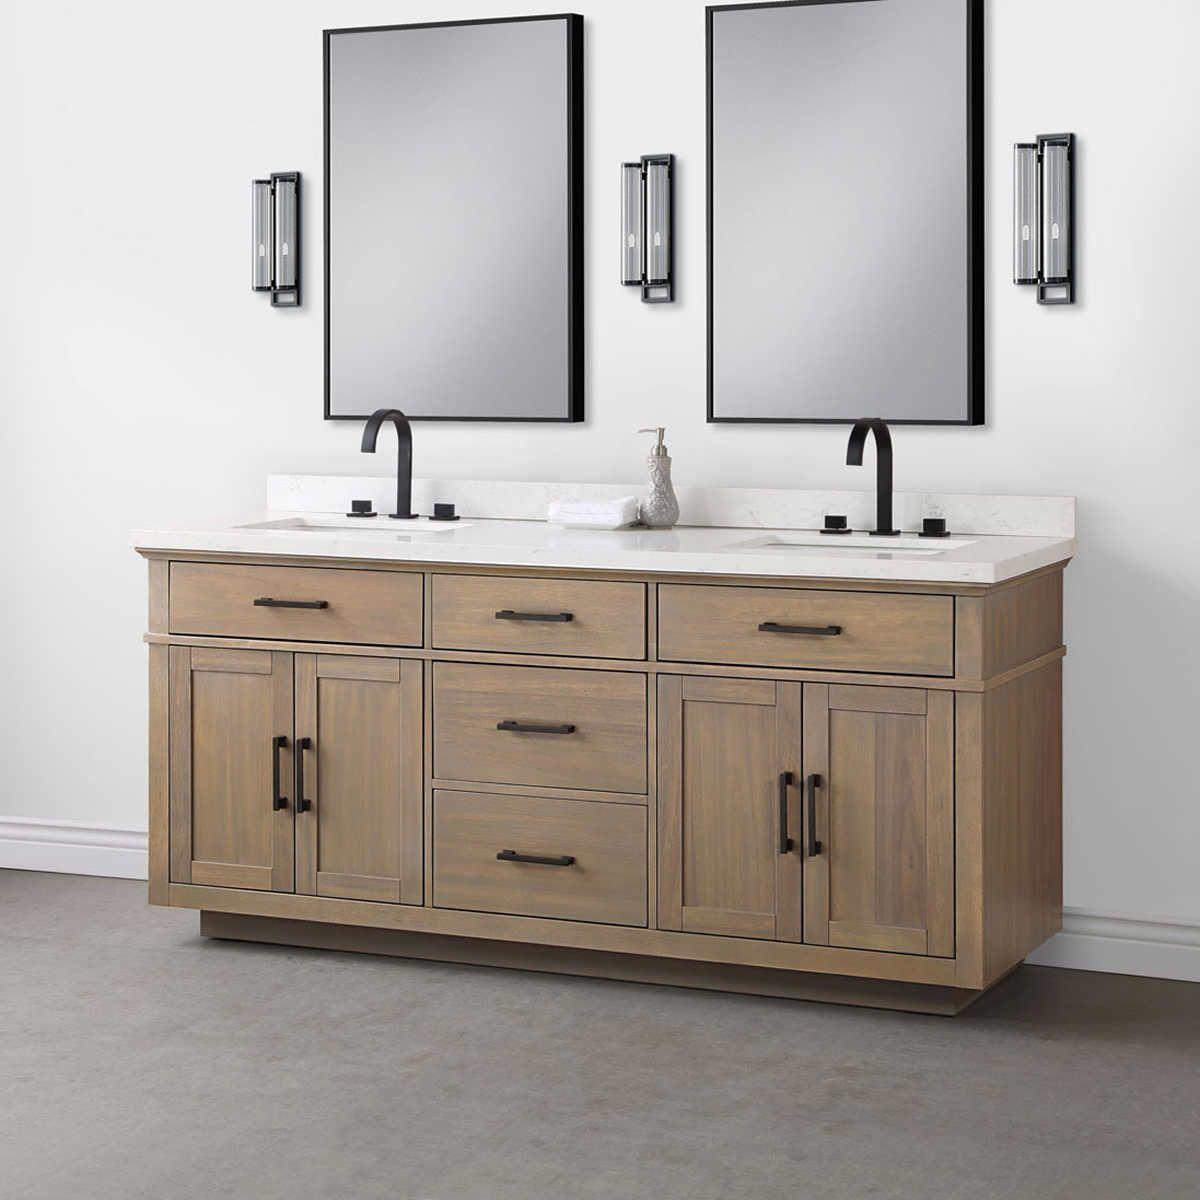 Brown 4 Vanity Double Sink Vanity 72 Vanity [ 1200 x 1200 Pixel ]